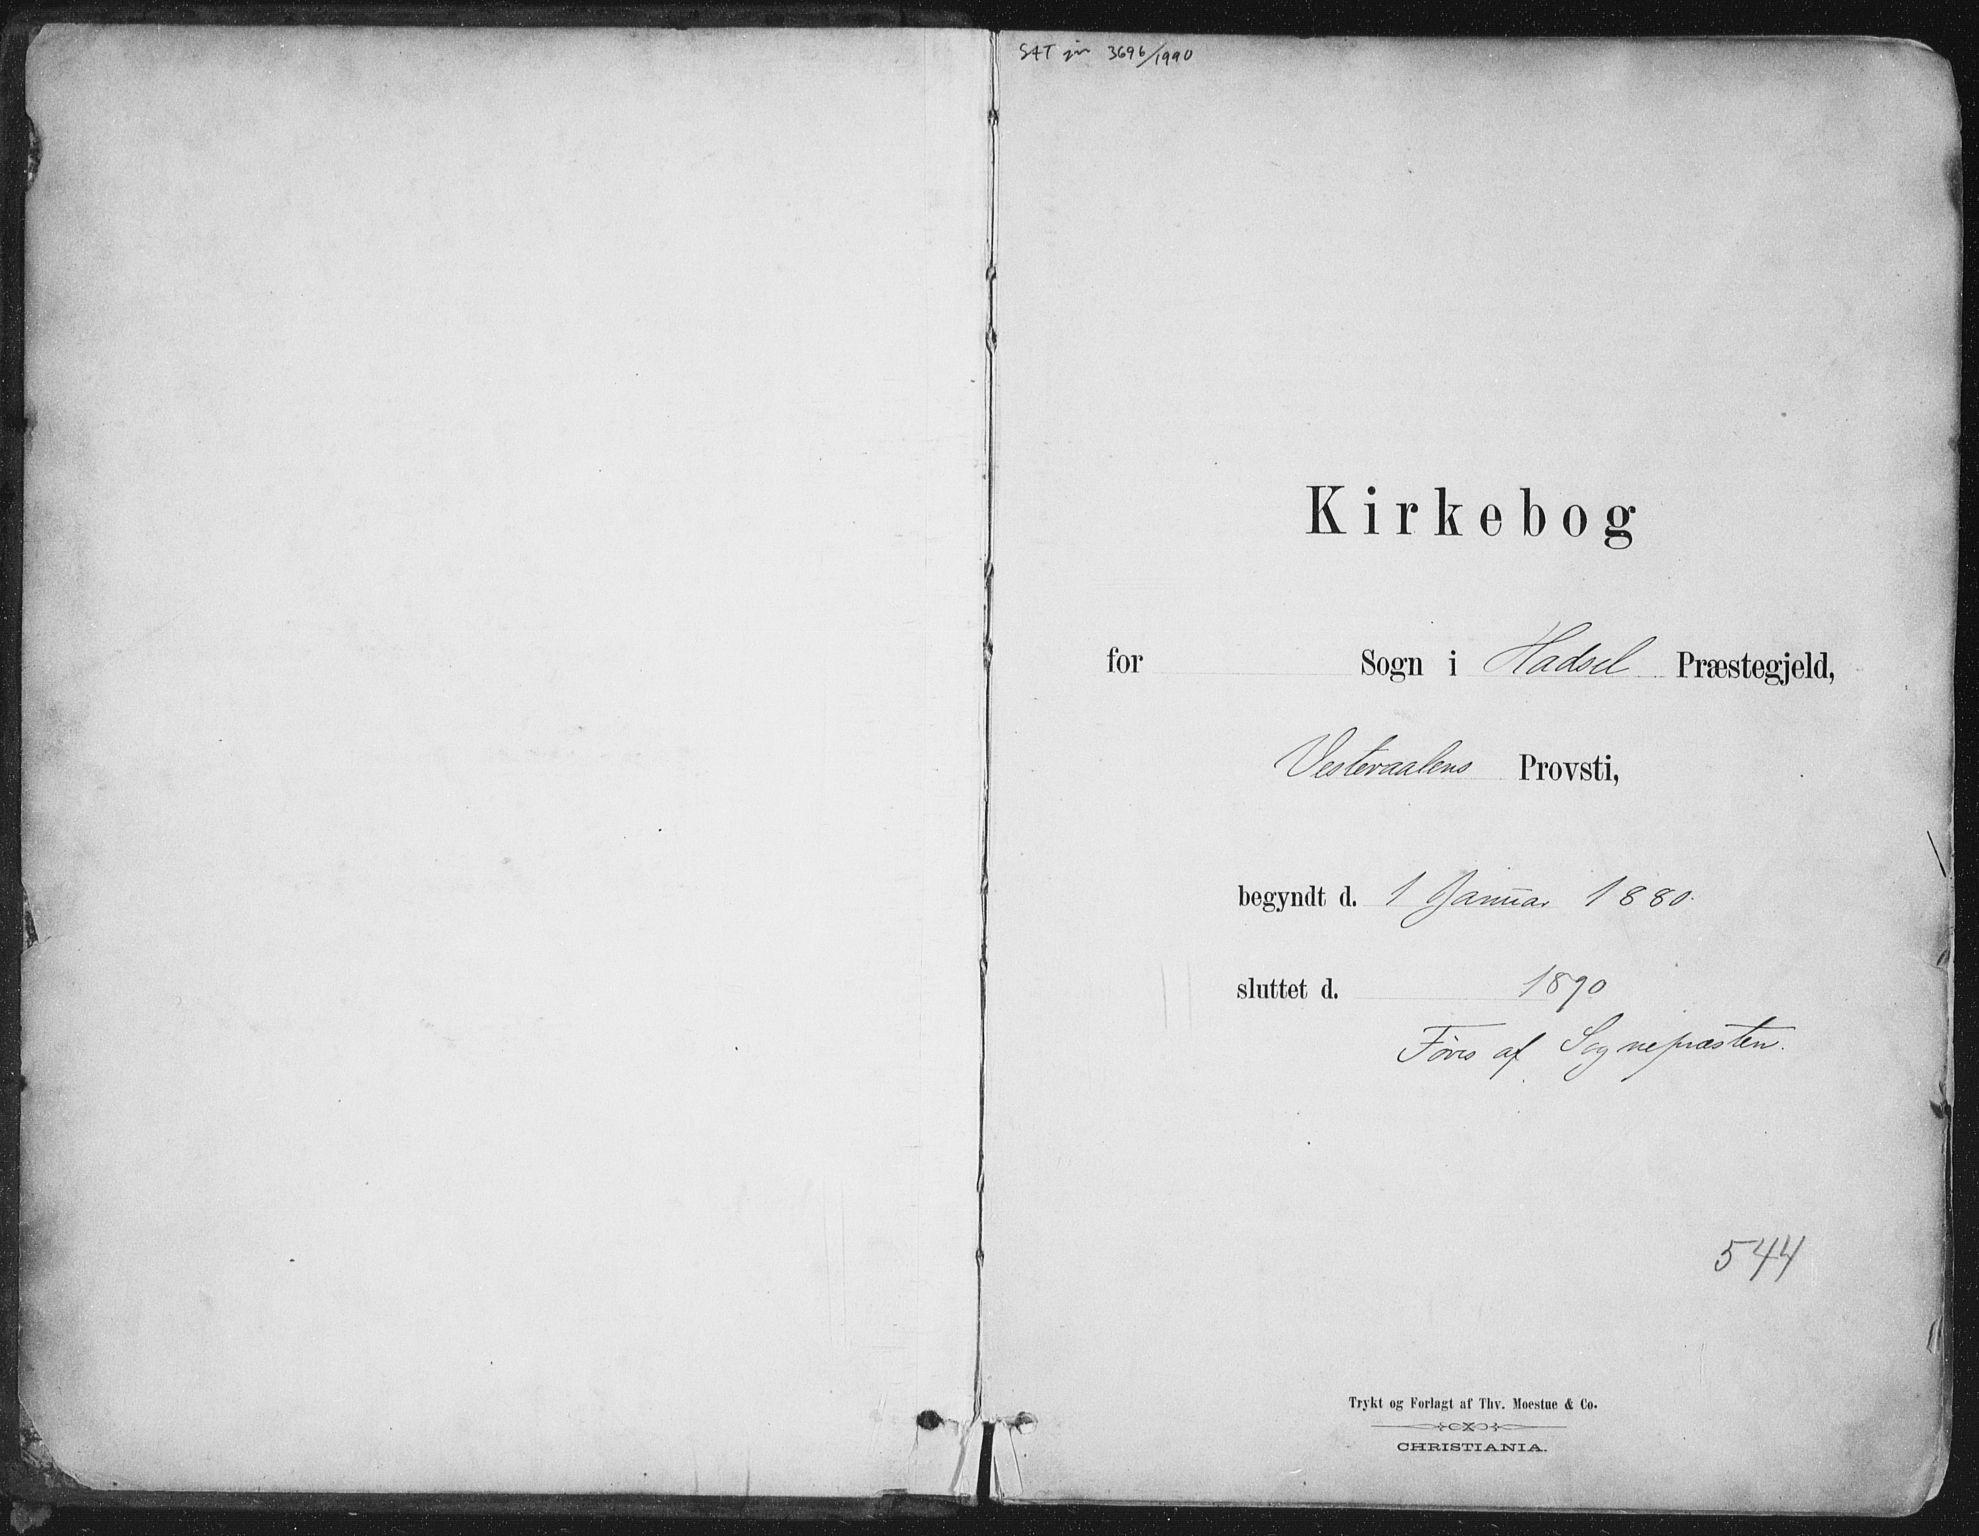 SAT, Ministerialprotokoller, klokkerbøker og fødselsregistre - Nordland, 888/L1244: Ministerialbok nr. 888A10, 1880-1890